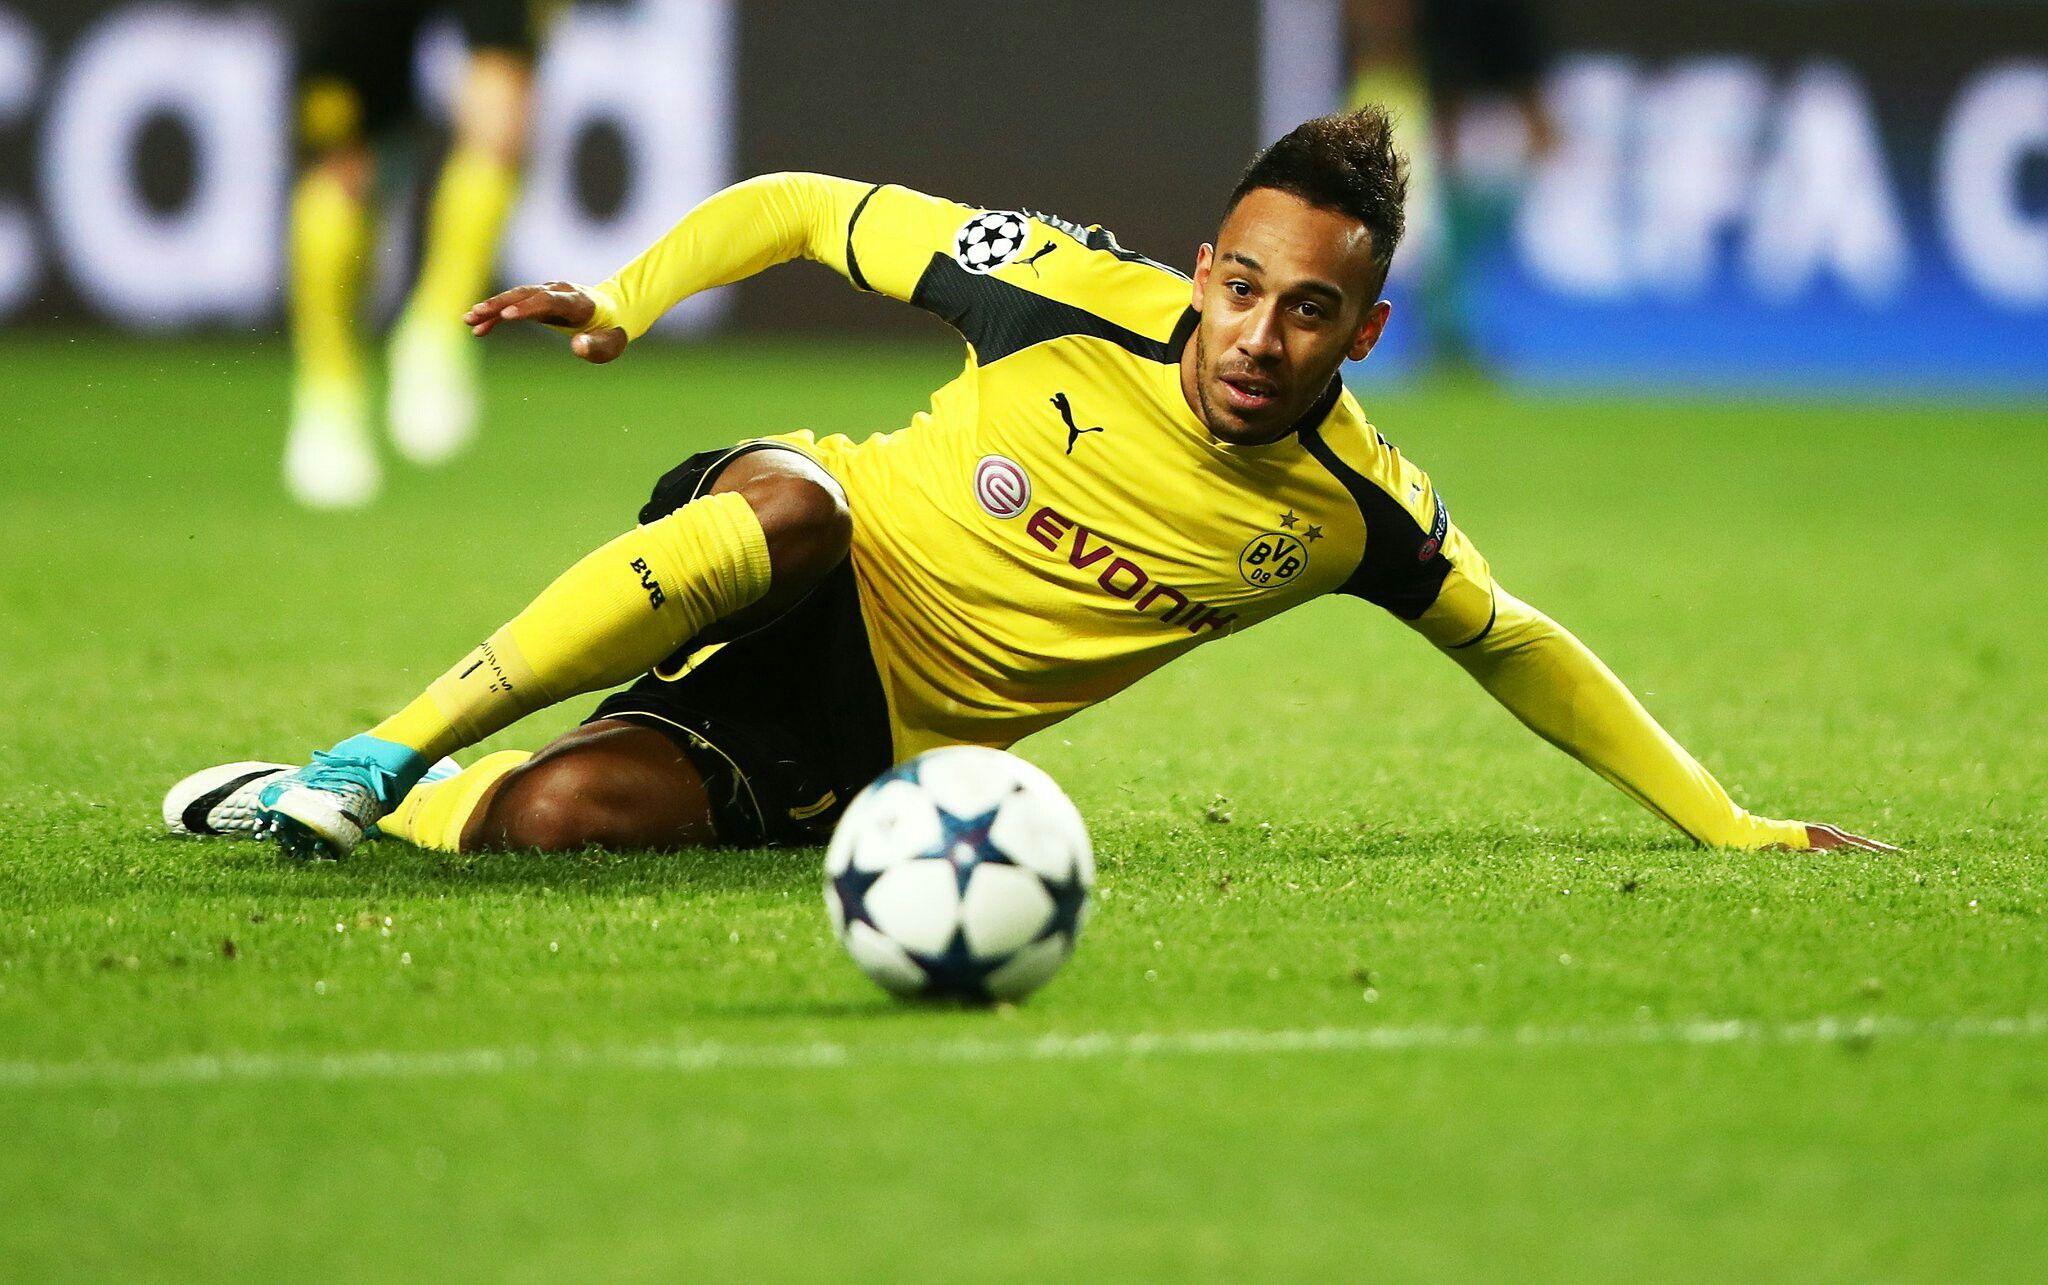 Pin by Númellótë on Borussia Dortmund Paris saint